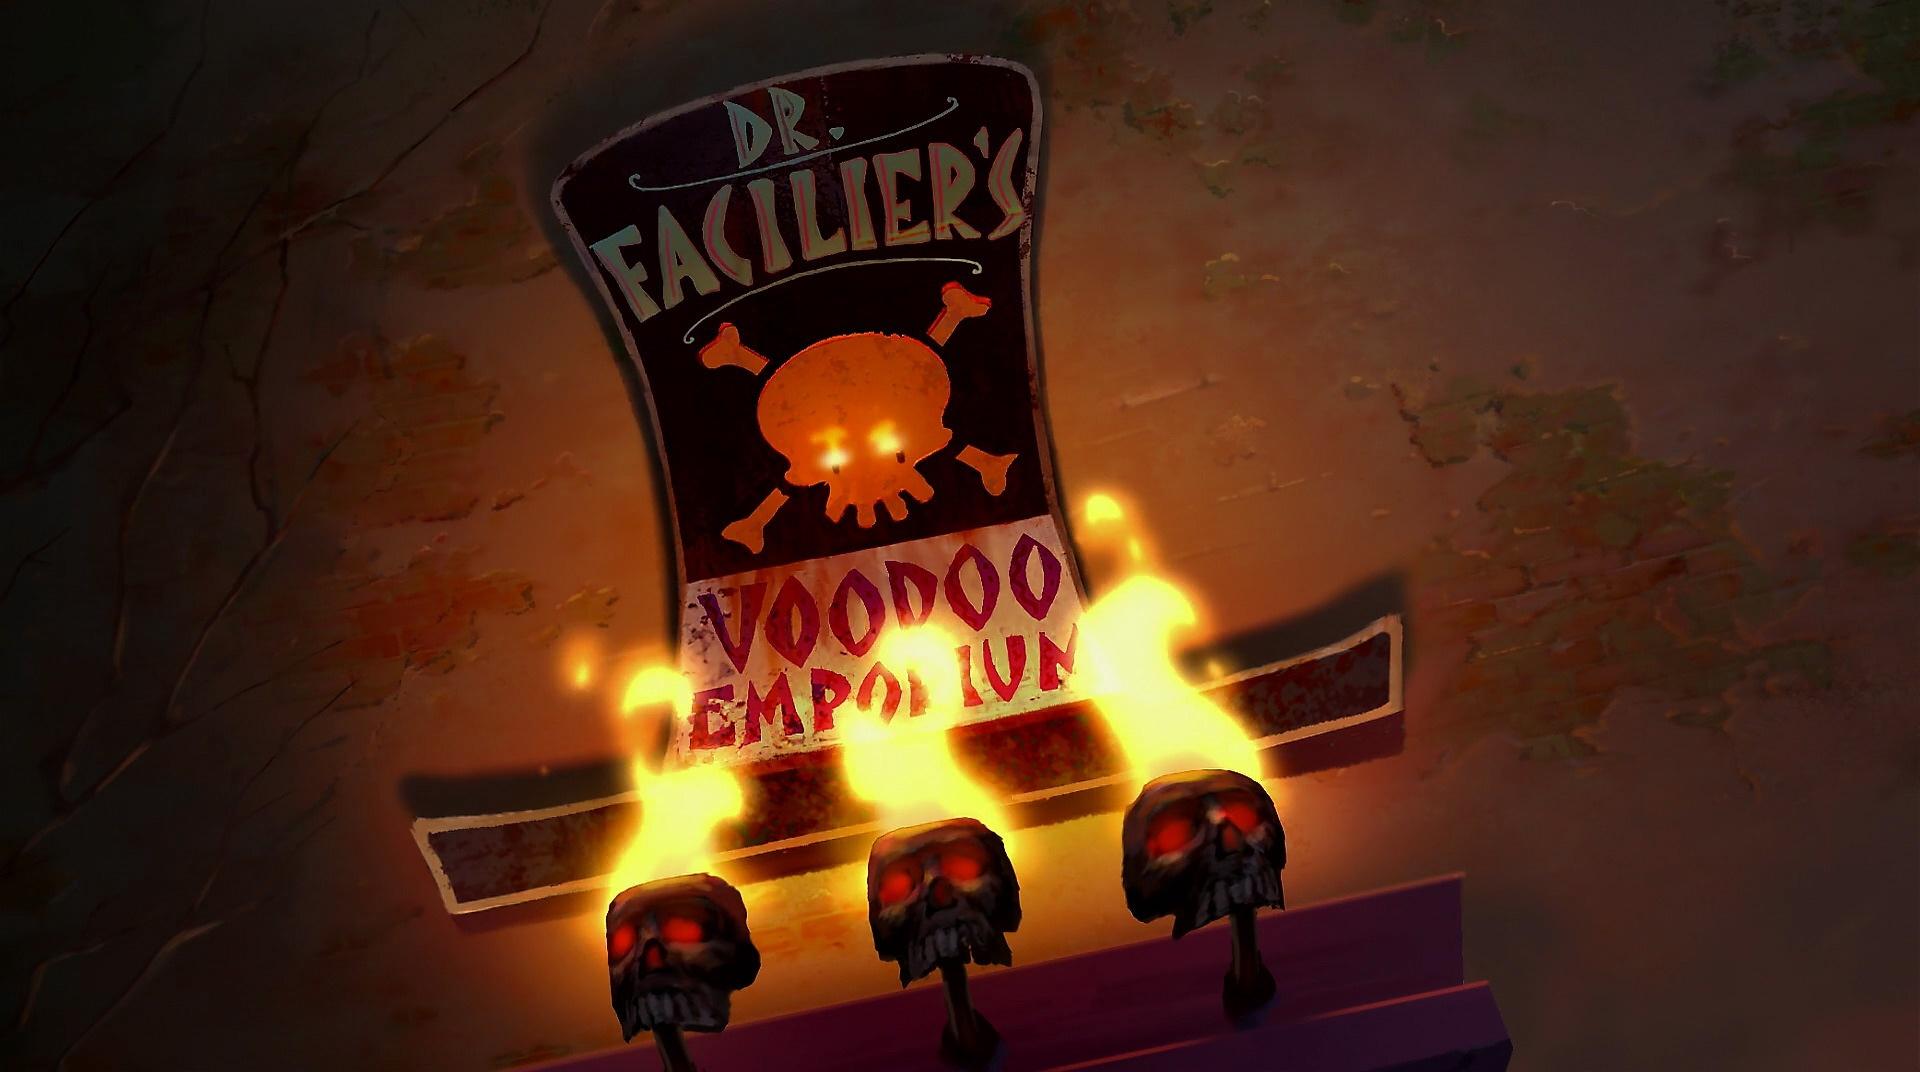 Empório de Vudu do Dr. Facilier